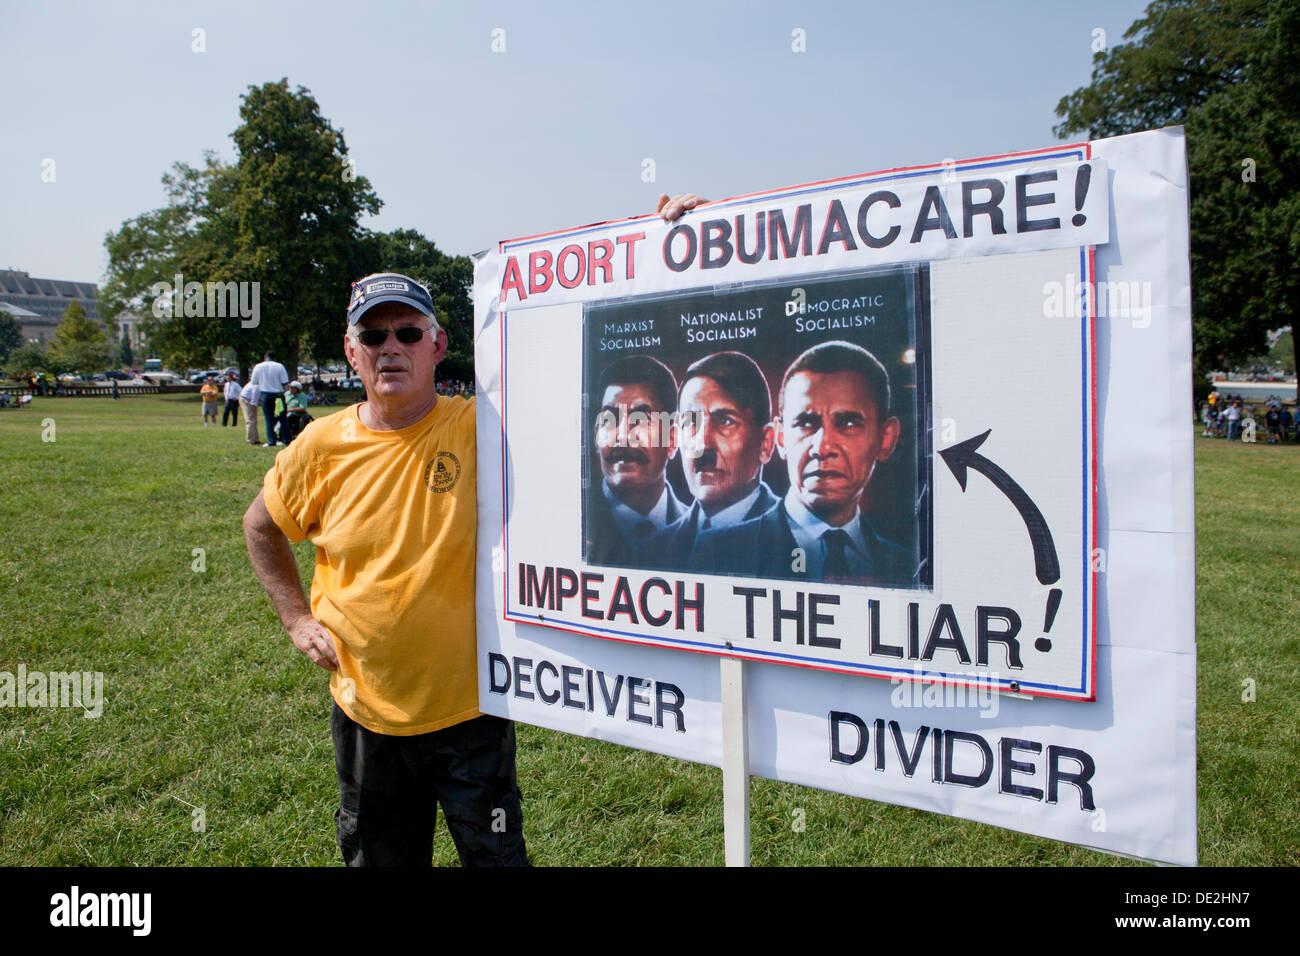 Man holding Anti-Obama sign - Washington, DC USA Stock Photo